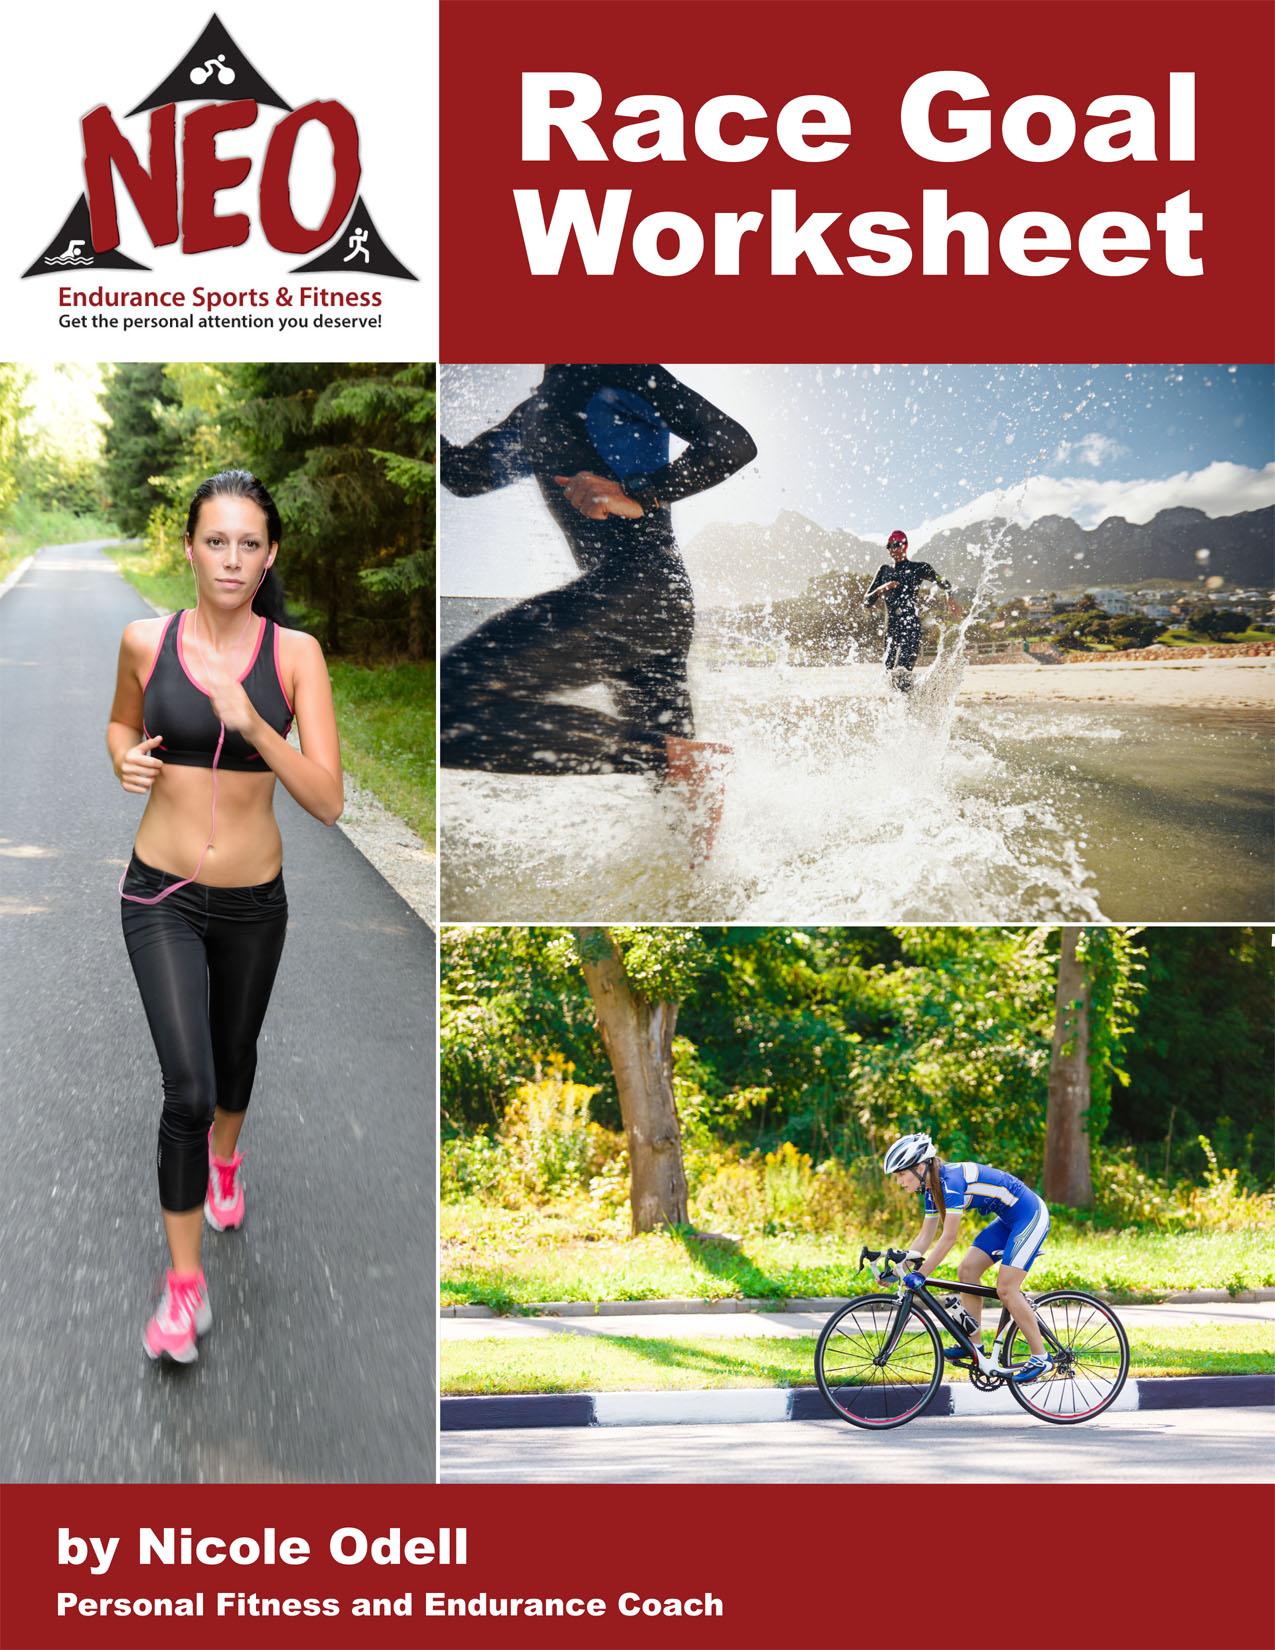 Race Worksheet